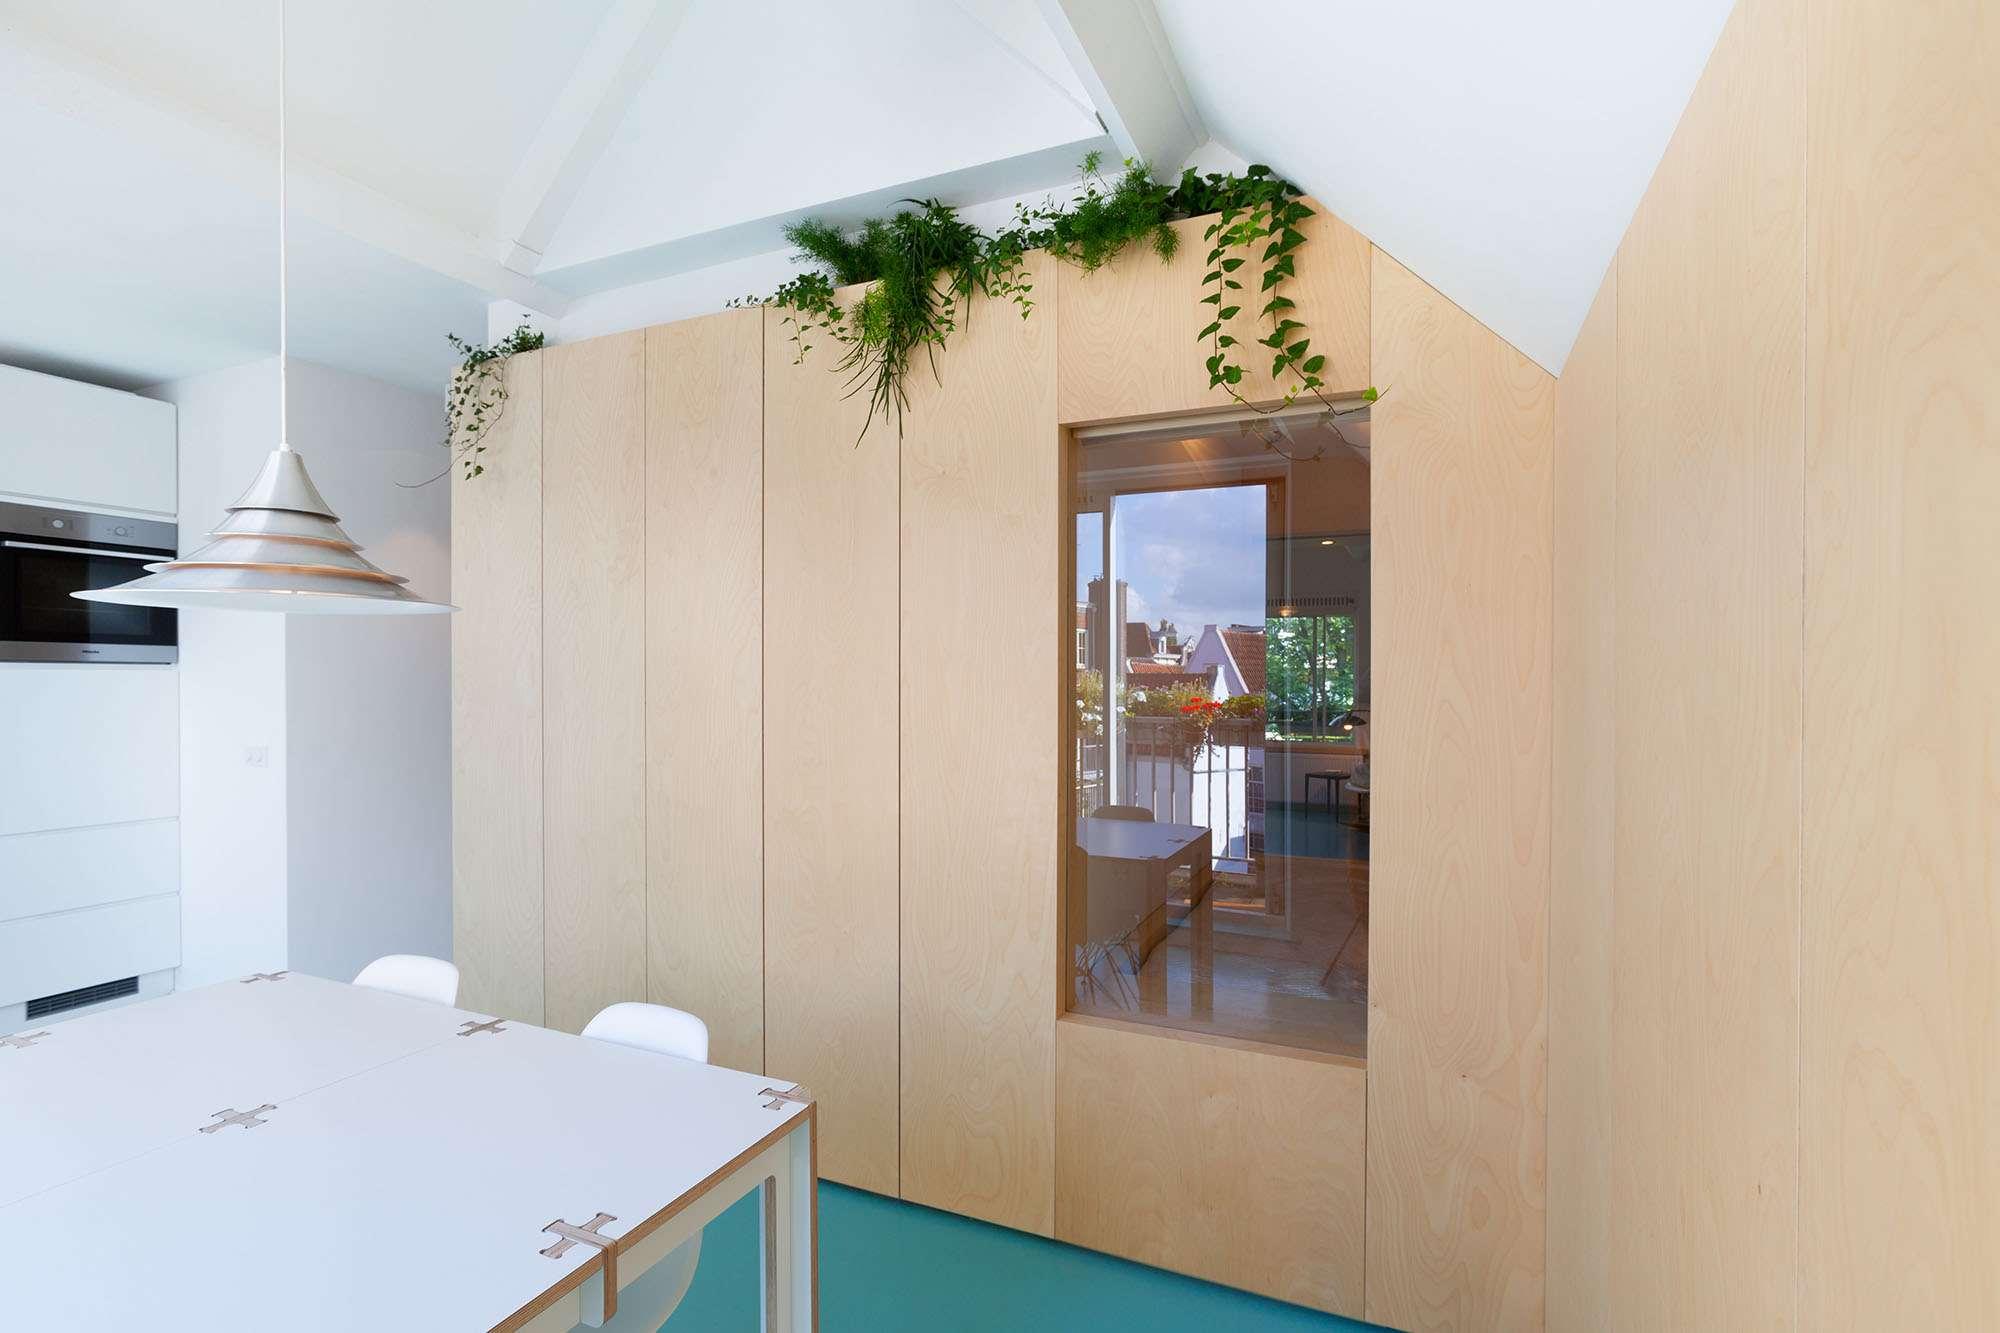 Amsterdam Urban Loft by Bureau Fraai dining room and kitchen